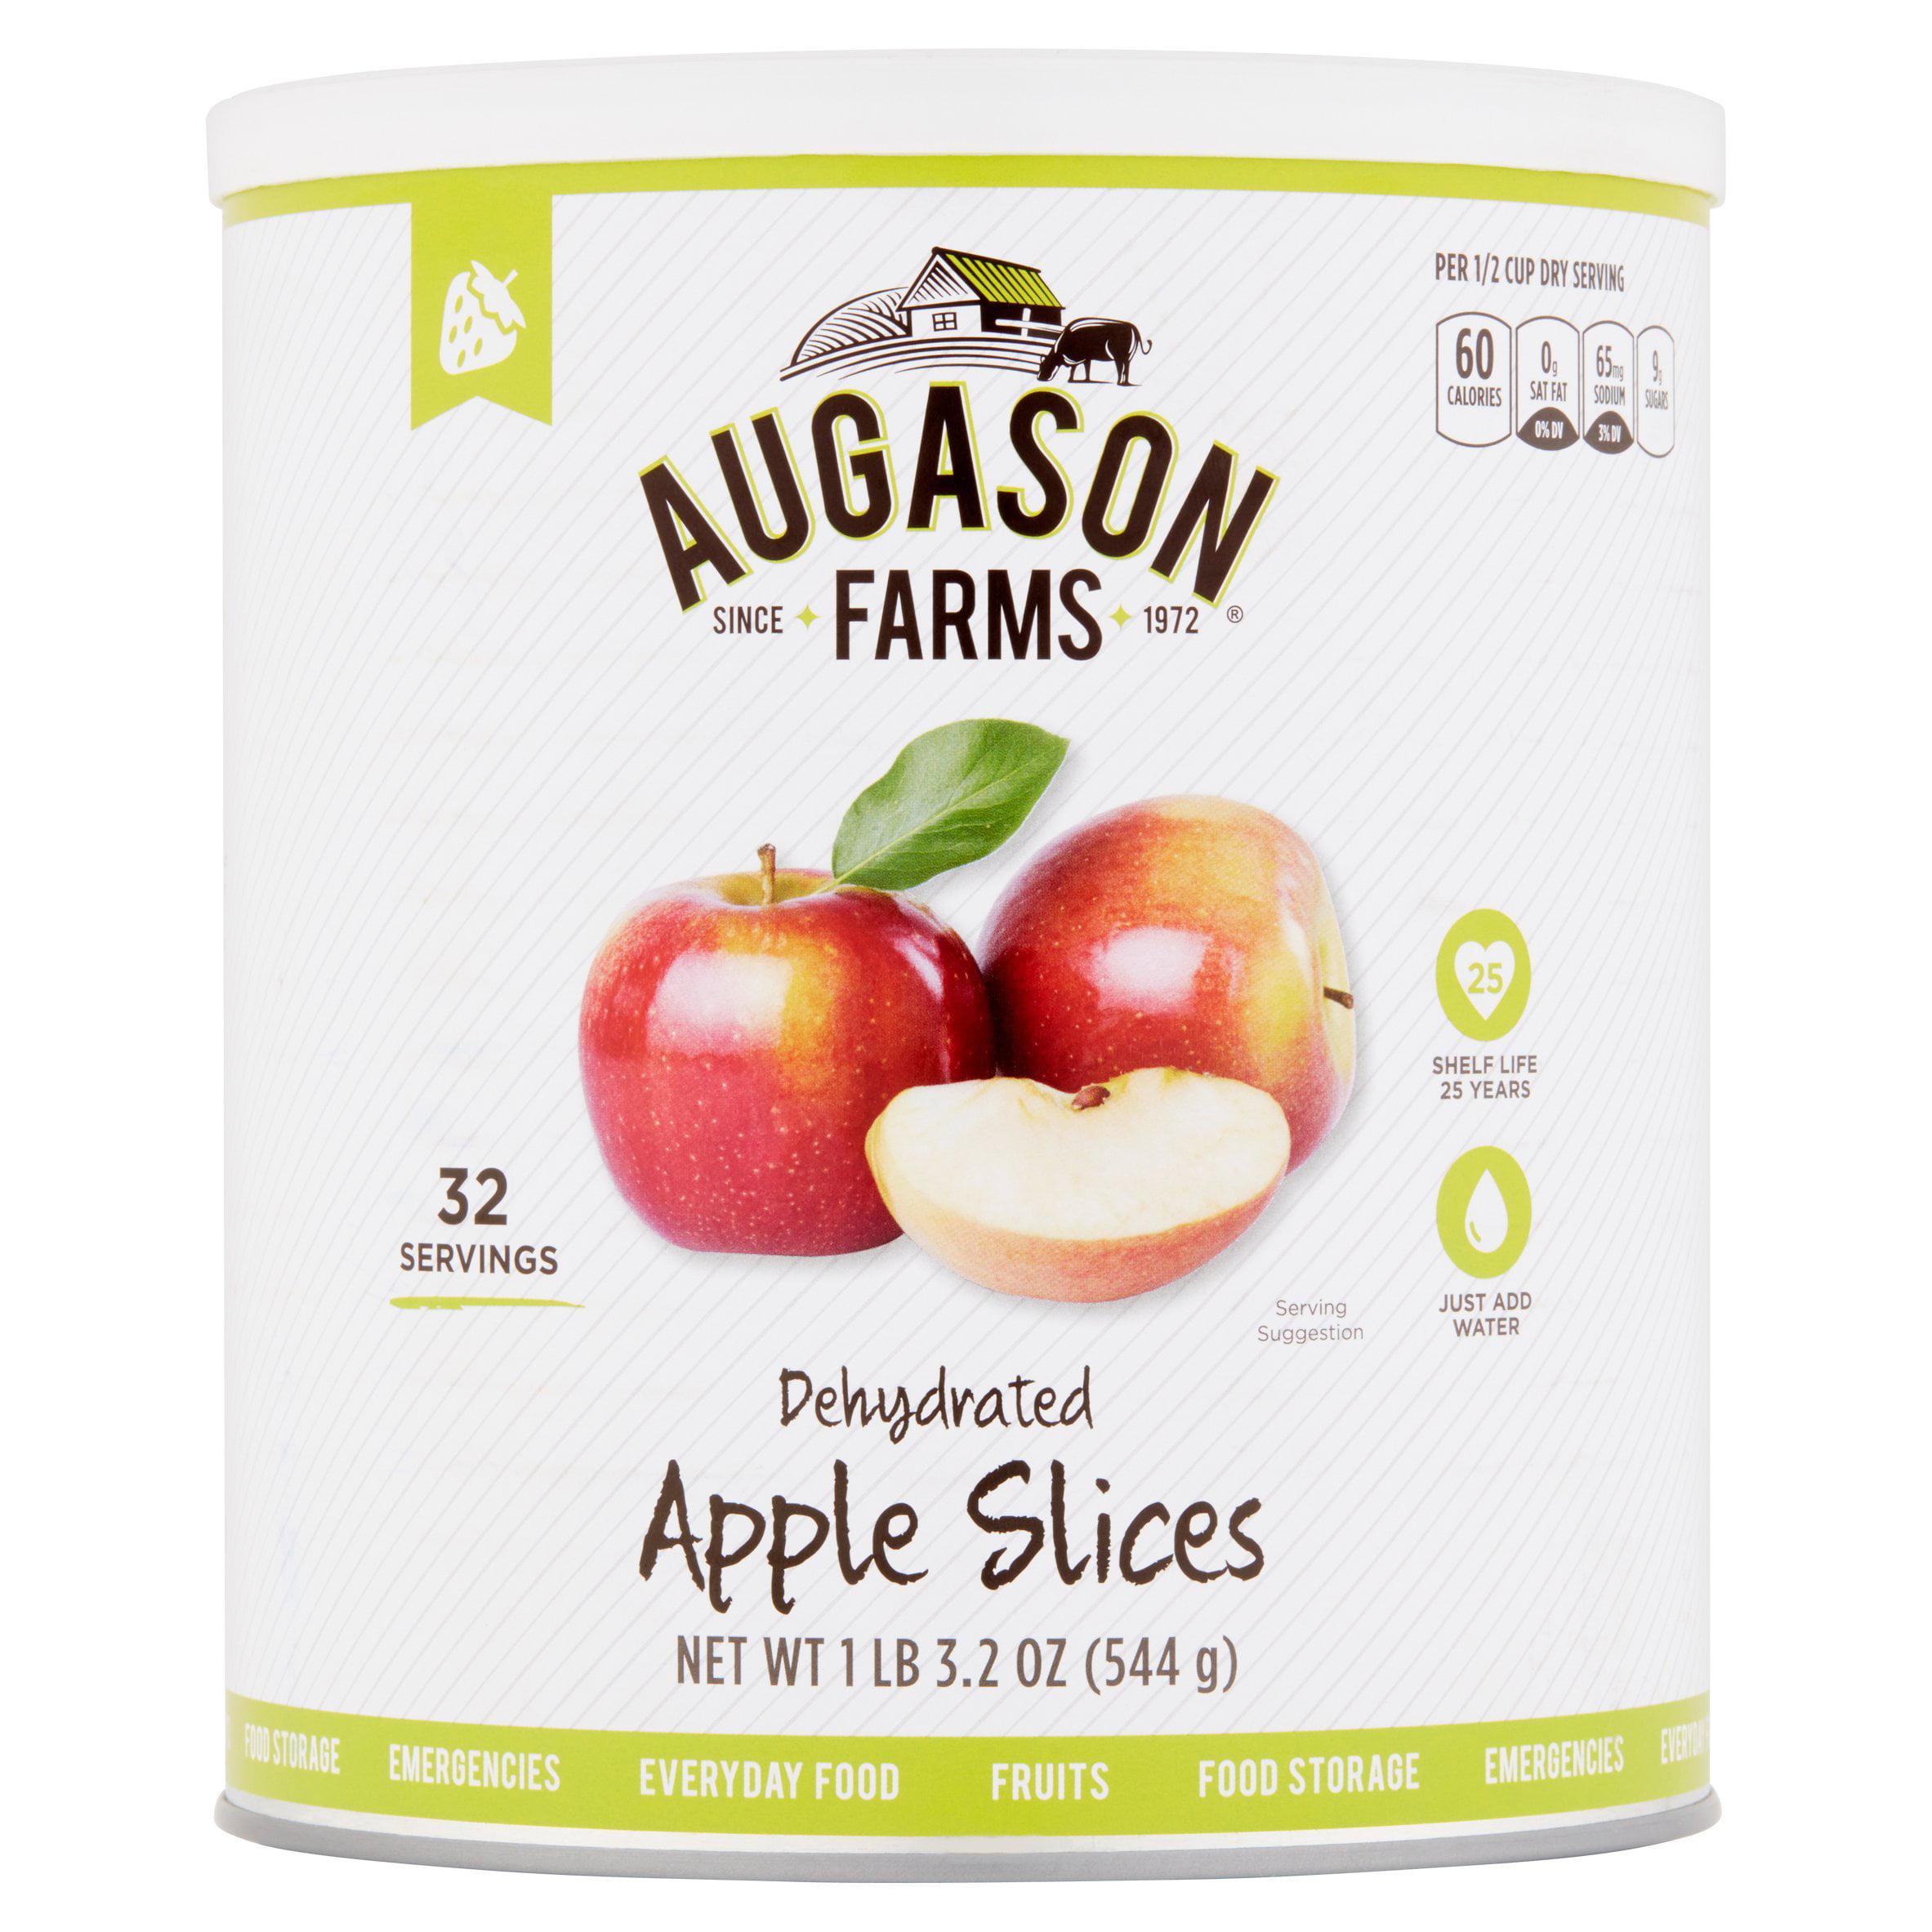 Augason Farms Emergency Food Dehydrated Apple Slices, 19.2 oz by Augason Farms